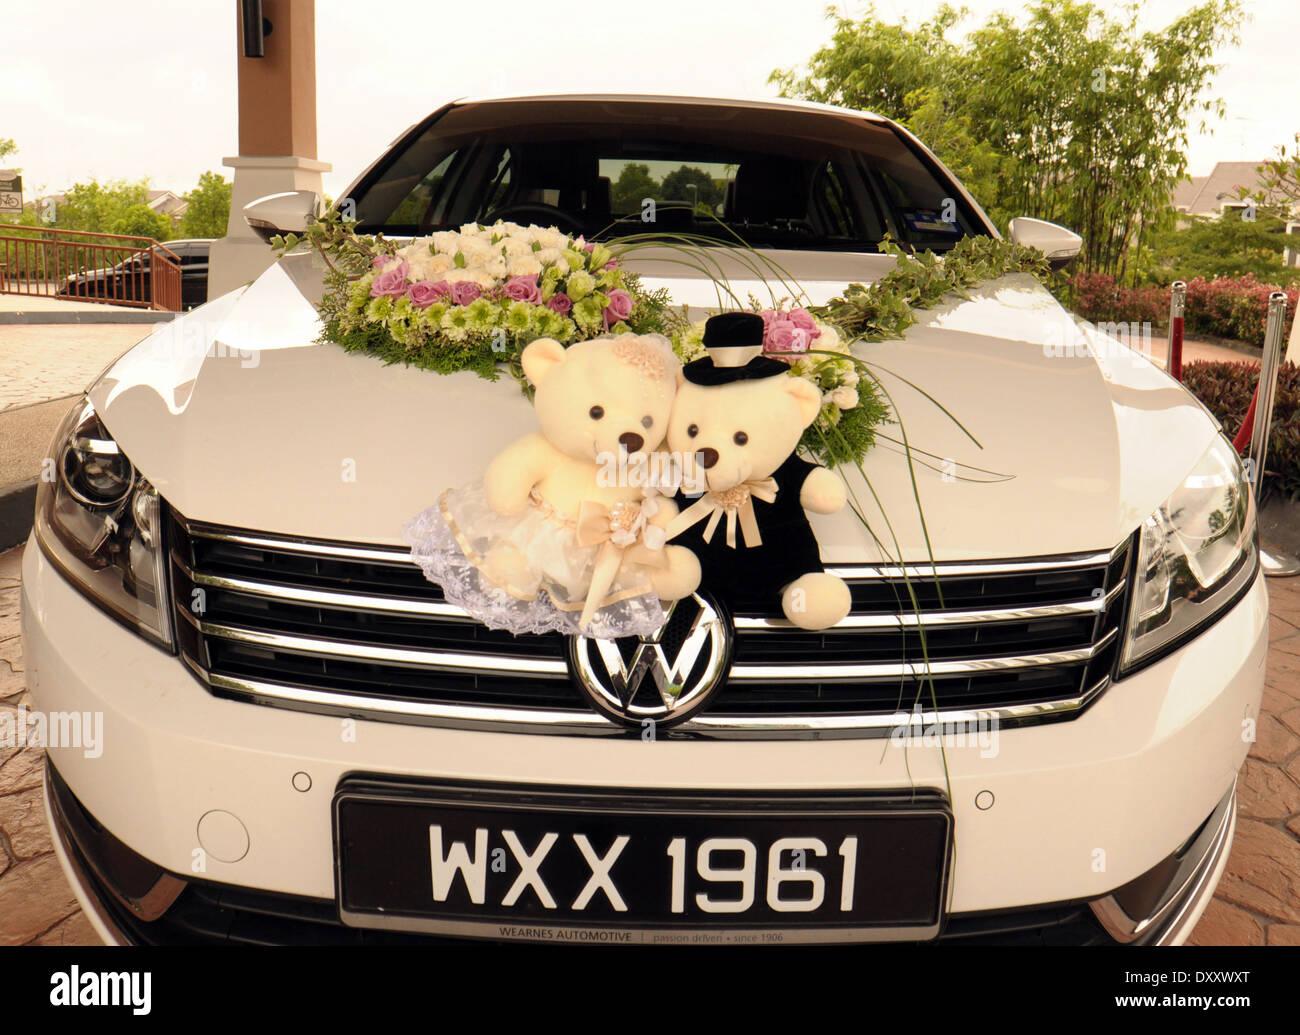 Design of bridal car - Stock Photo Bridal Car With Teddy Bears